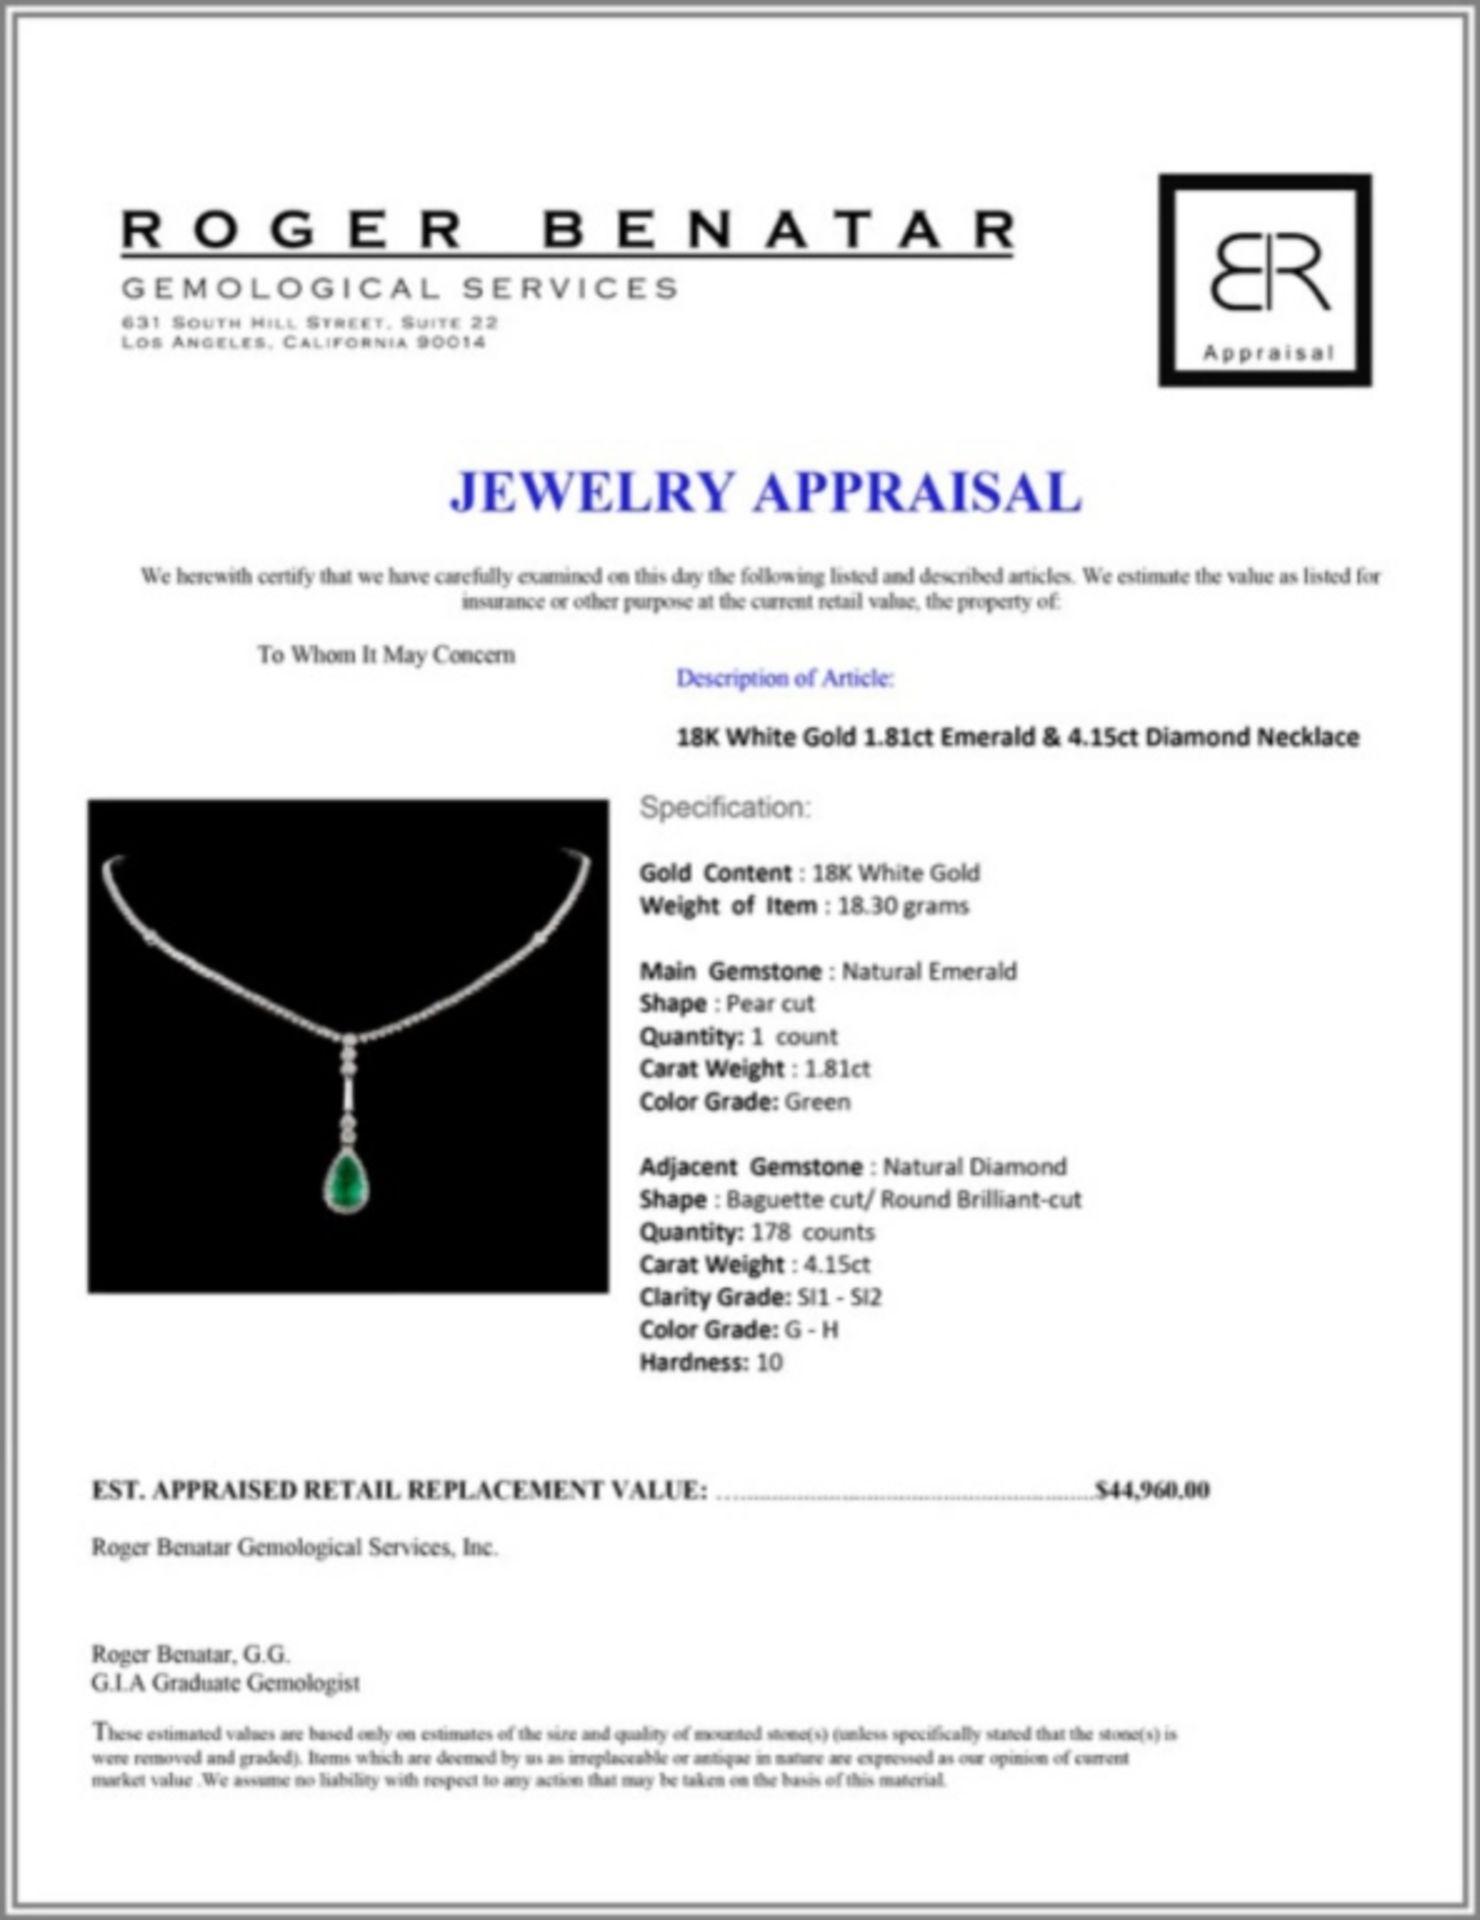 18K White Gold 1.81ct Emerald & 4.15ct Diamond Nec - Image 3 of 3